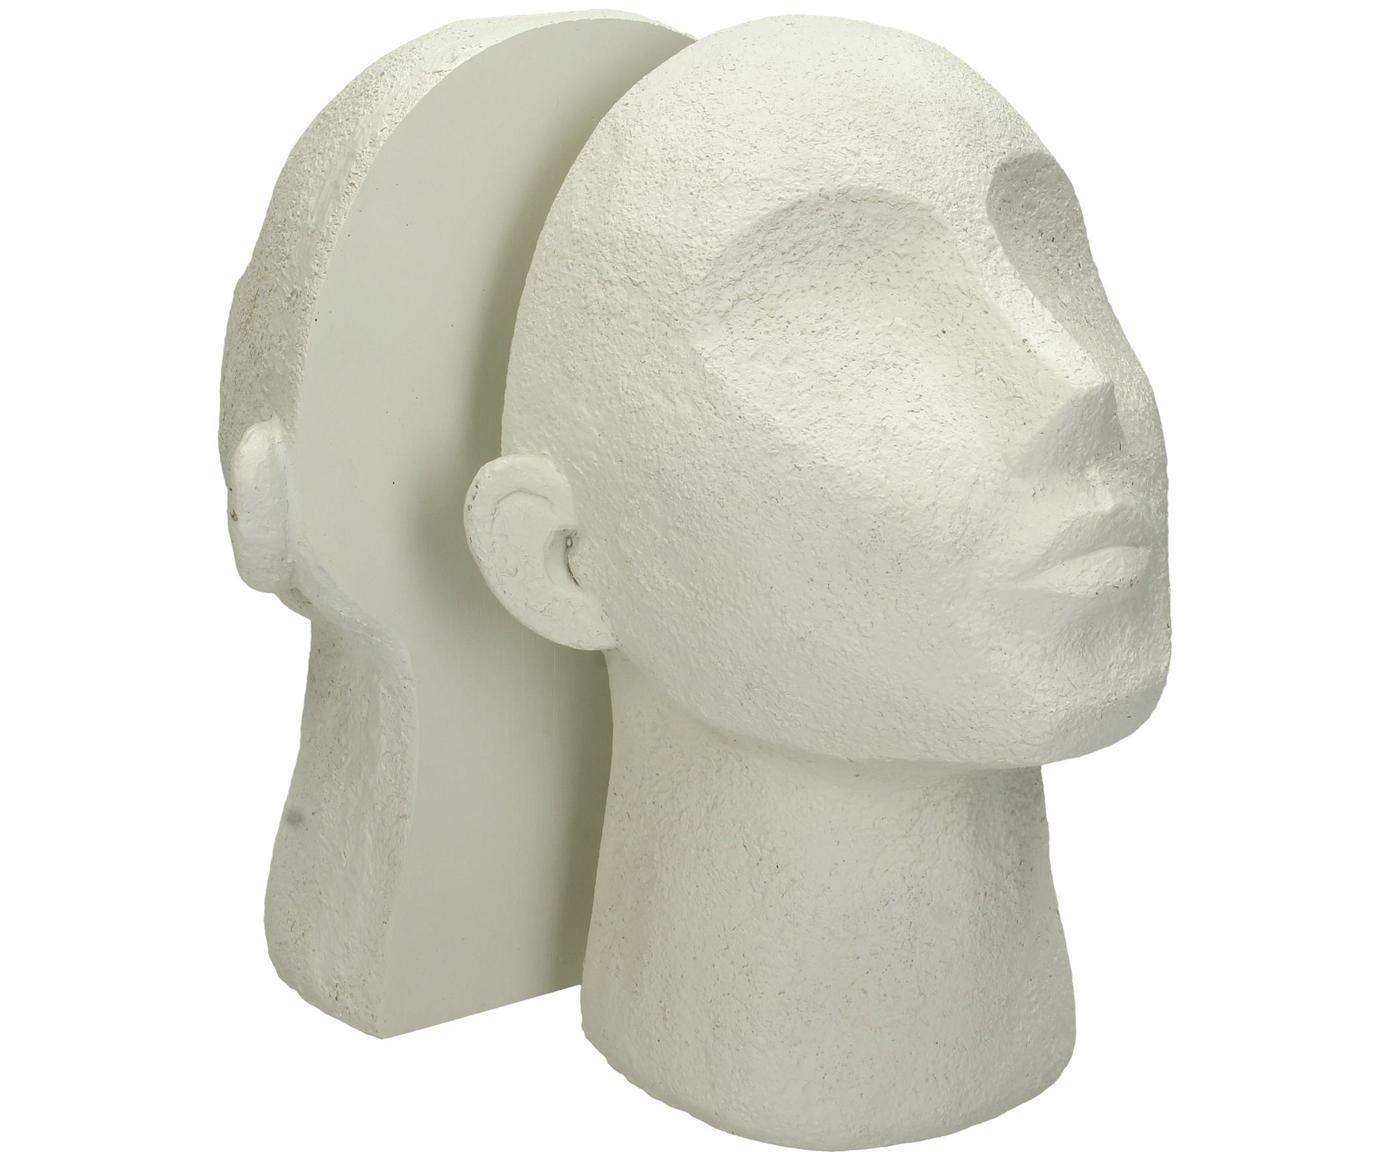 Fermalibri Testa 2 pz, Poliresina, Bianco latteo, Larg. 23 x Alt. 32 cm